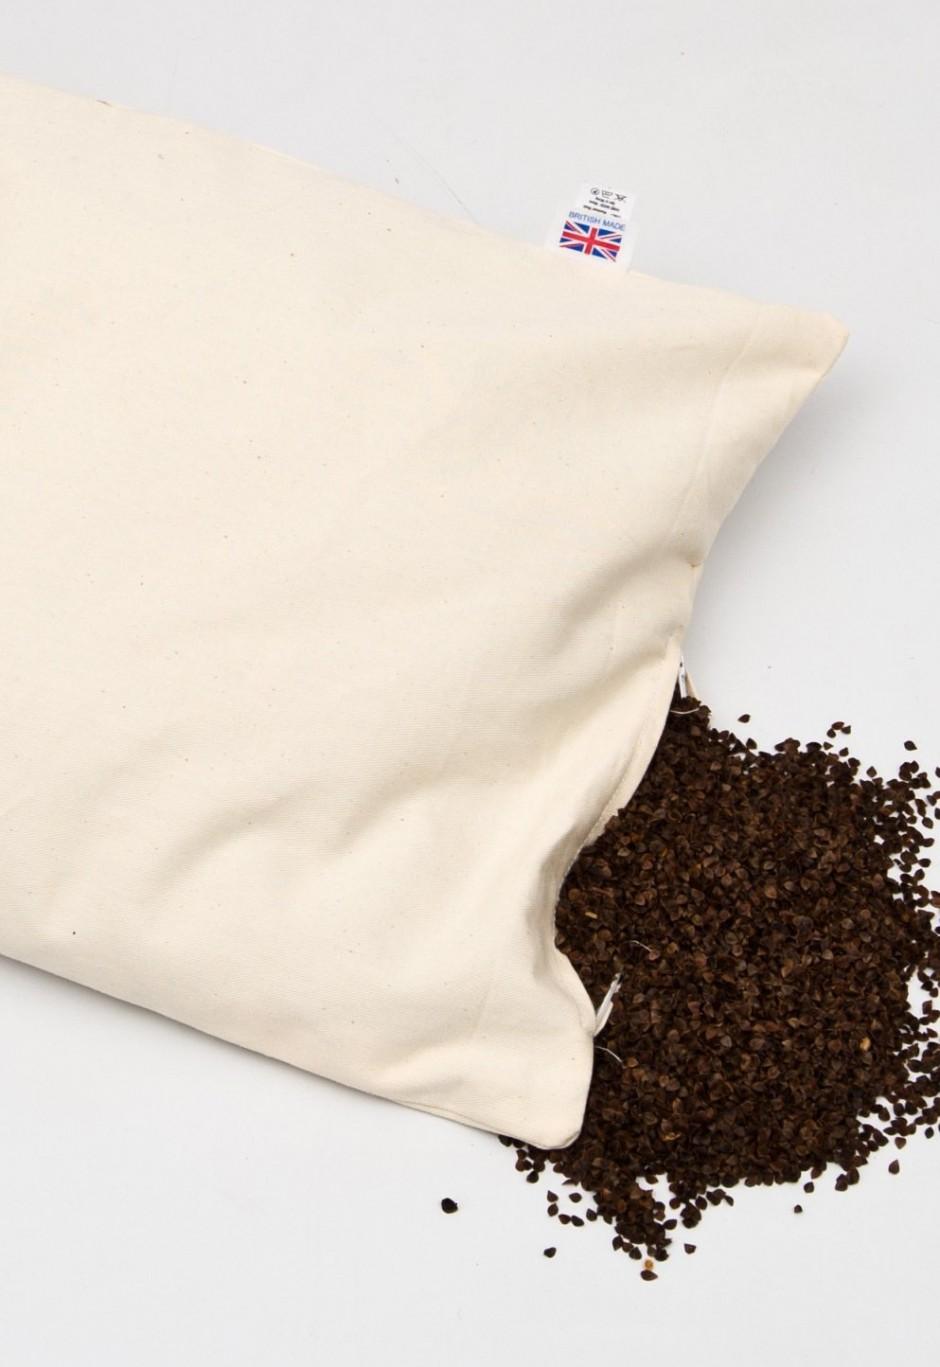 Organic Buckwheat Hull Pillow   Buckwheat Pillow Benefits   Sobakawa Buckwheat Pillow Queen